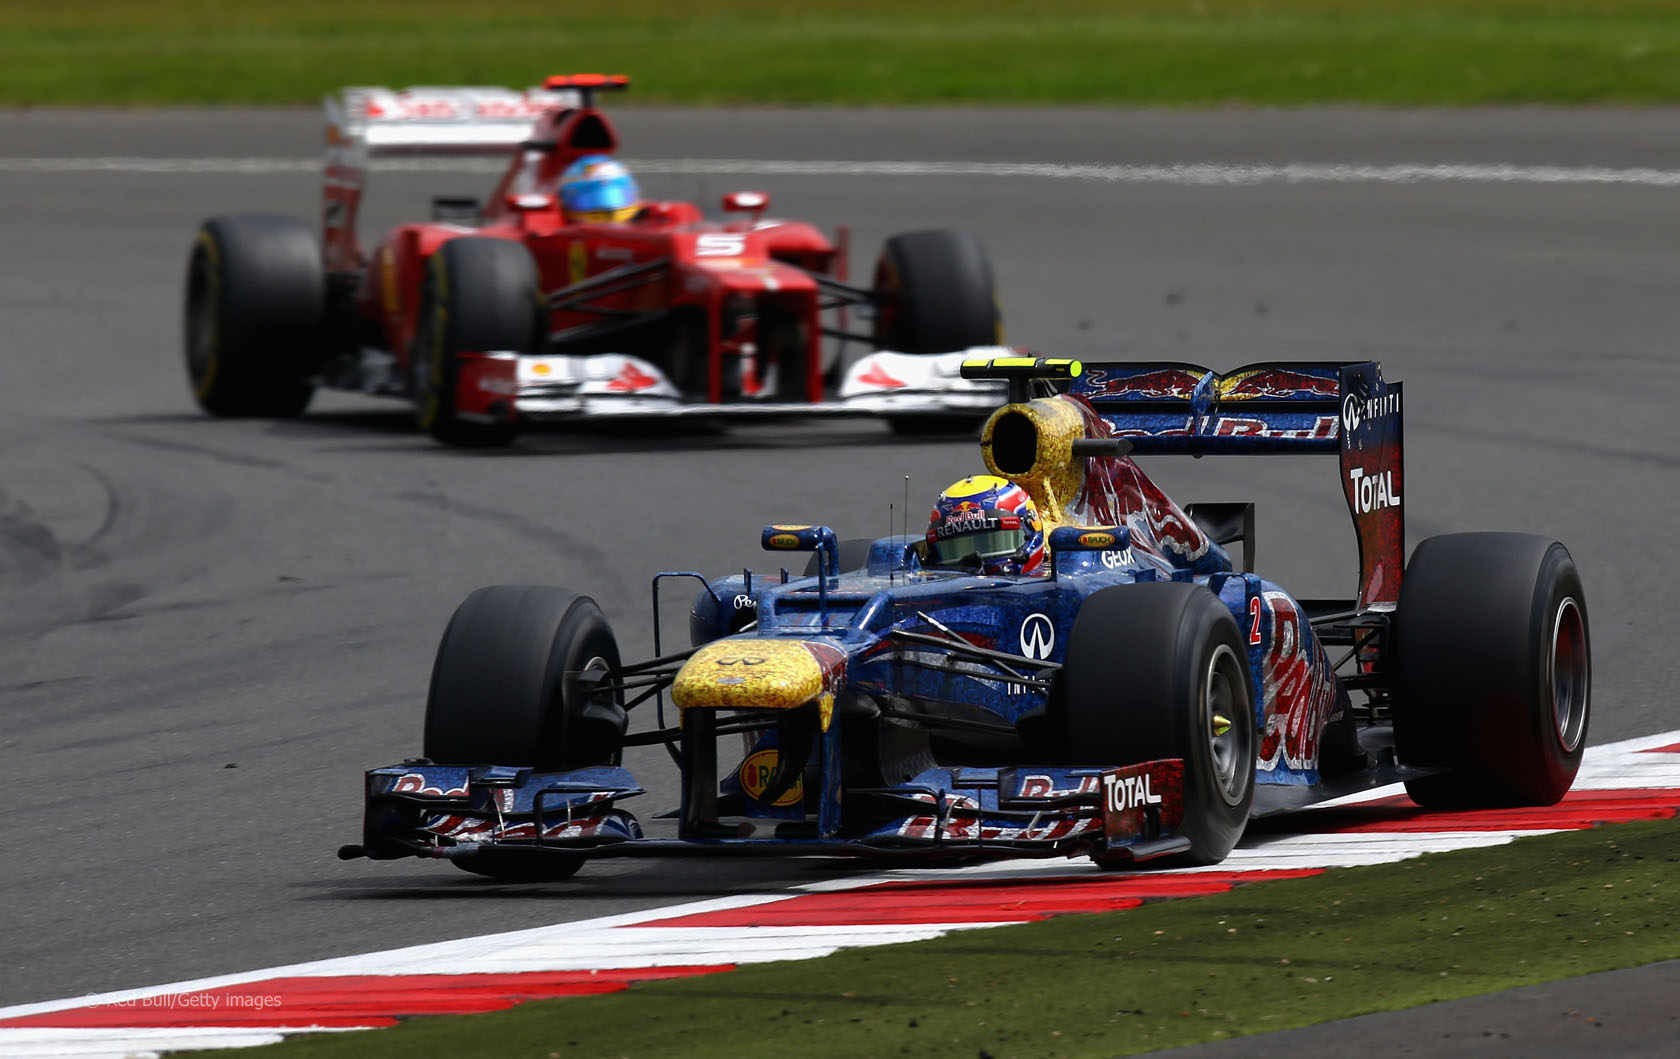 Mark Webber slavio je 2012. ispred Fernanda Alonsa nakon što ga je prestigao nekoliko krugova prije kraja. Red Bull je na toj utrci imao posebni vizualni identitet u čast humanitarne akcije Wings for Life. (8.7.2012.) Foto: Getty Images